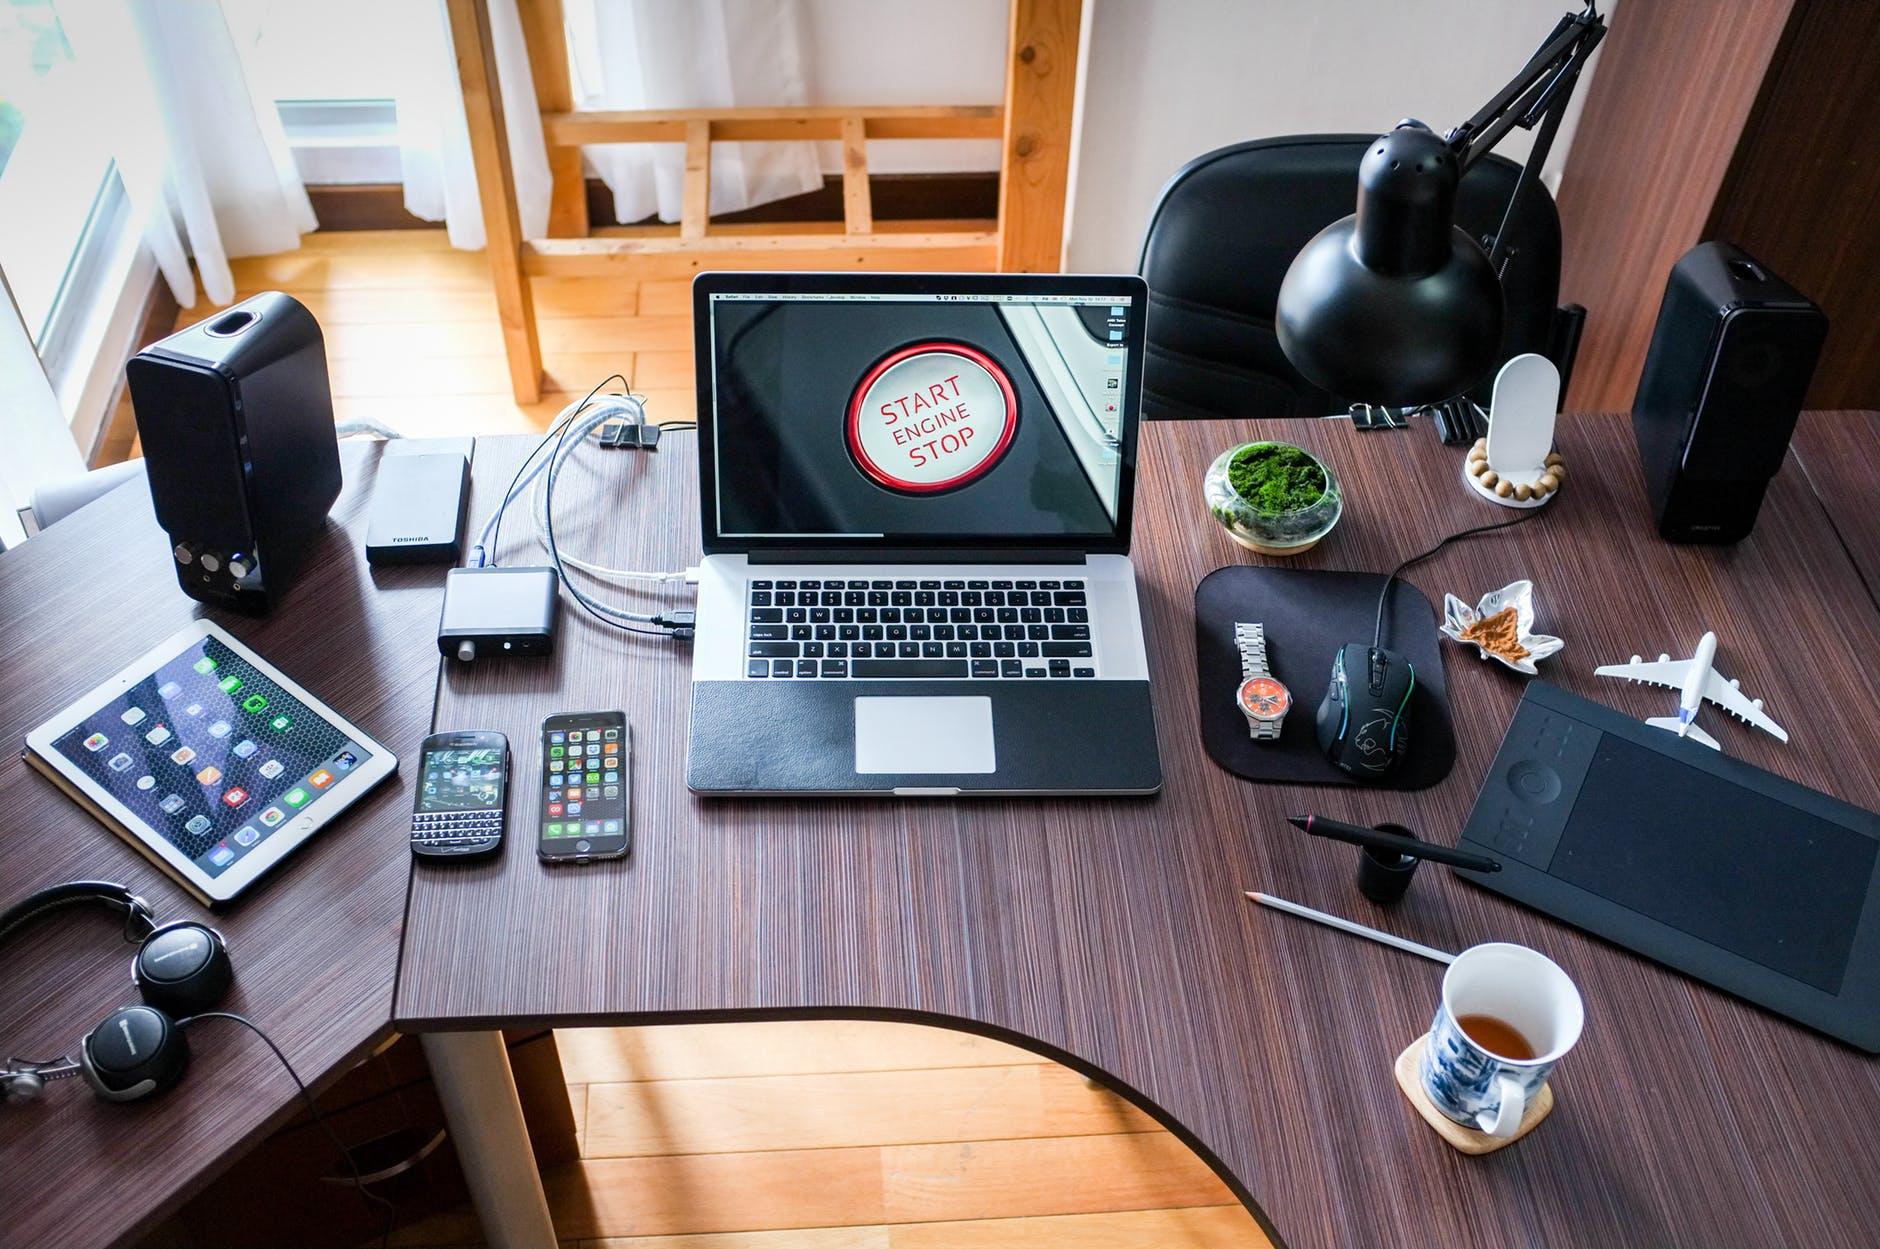 Business Electronics & Office Appliances